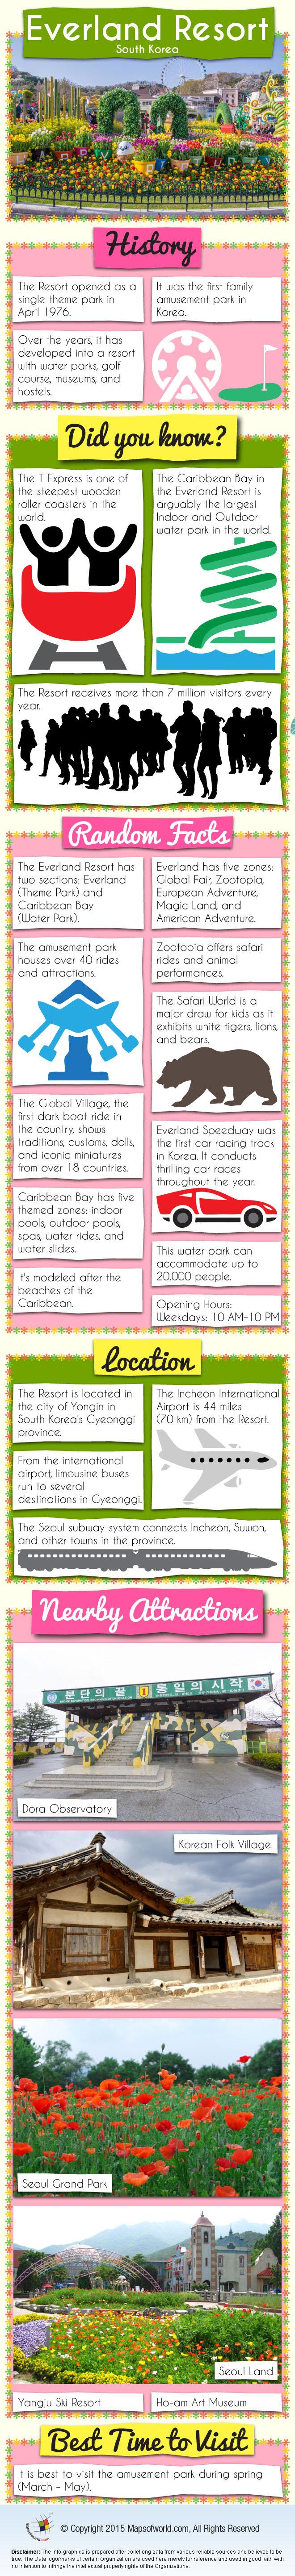 Everland Resort Infographic